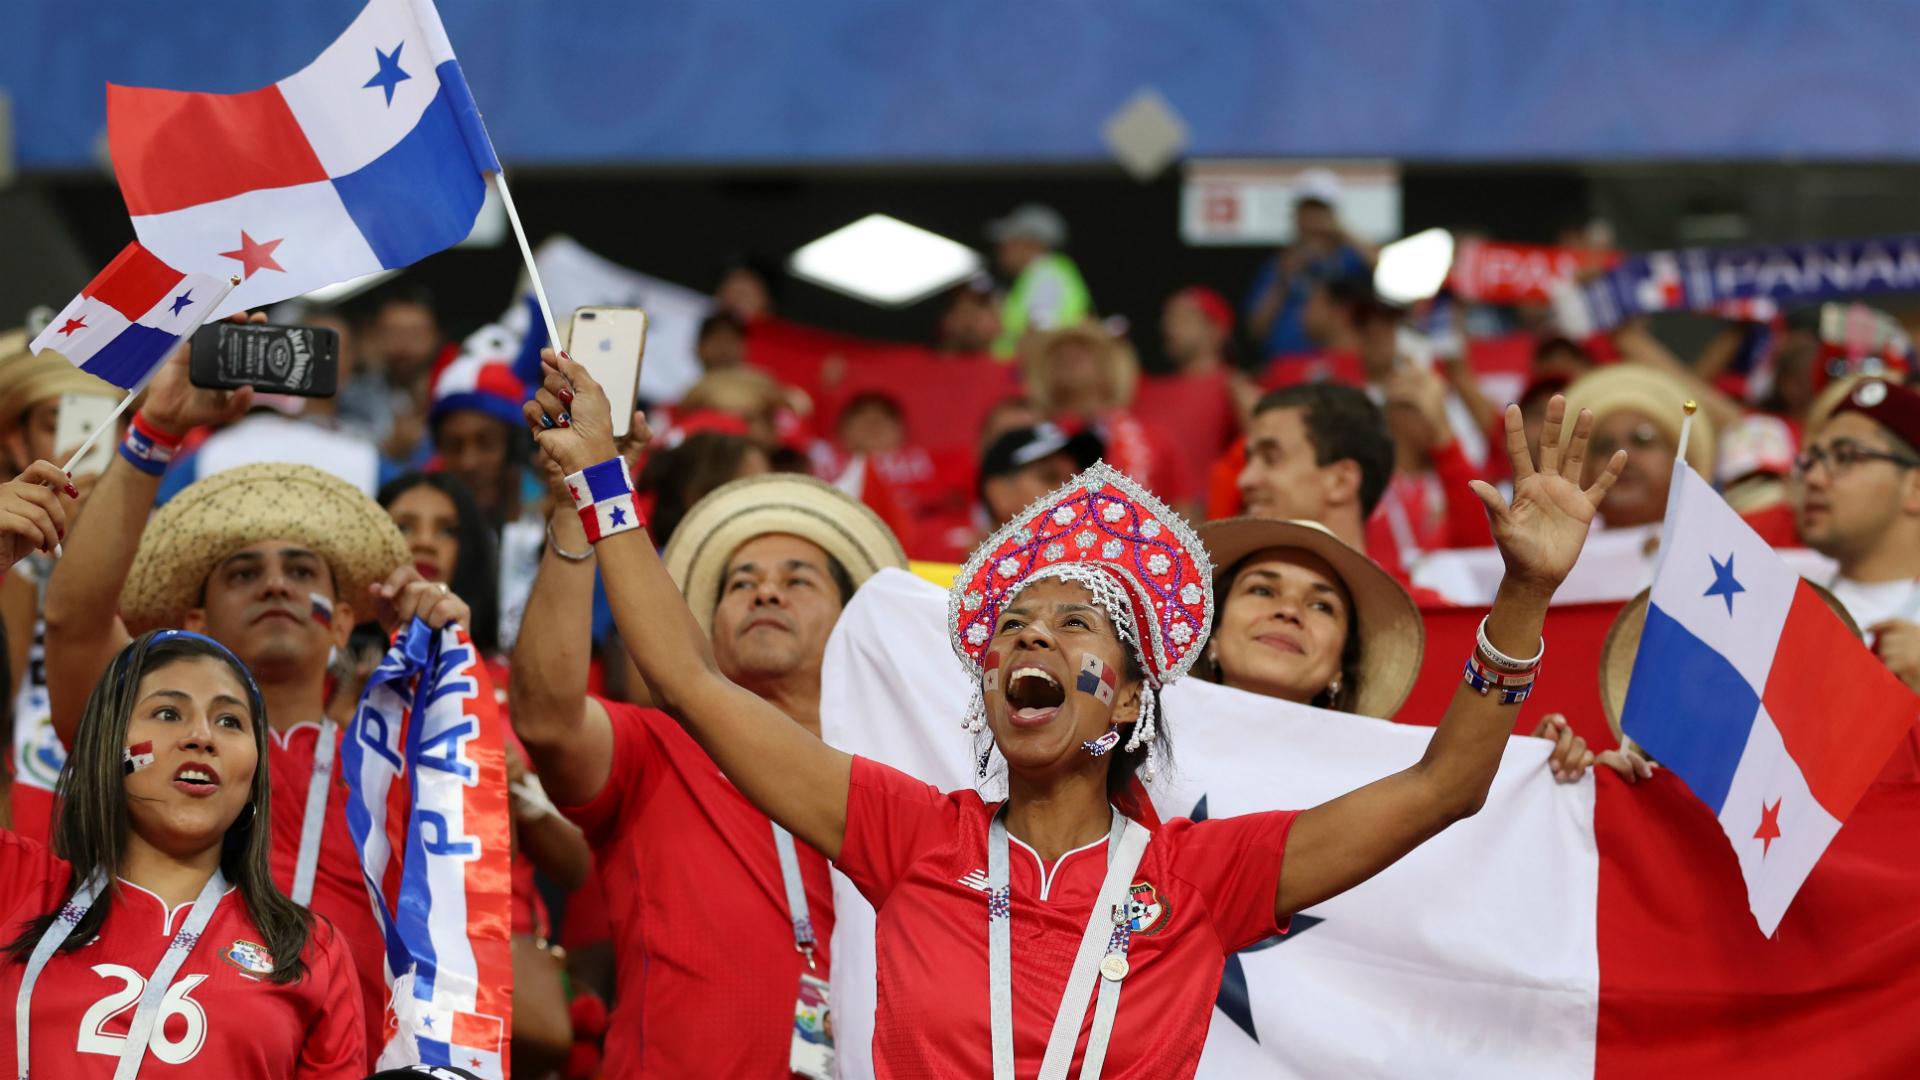 Panamá fans